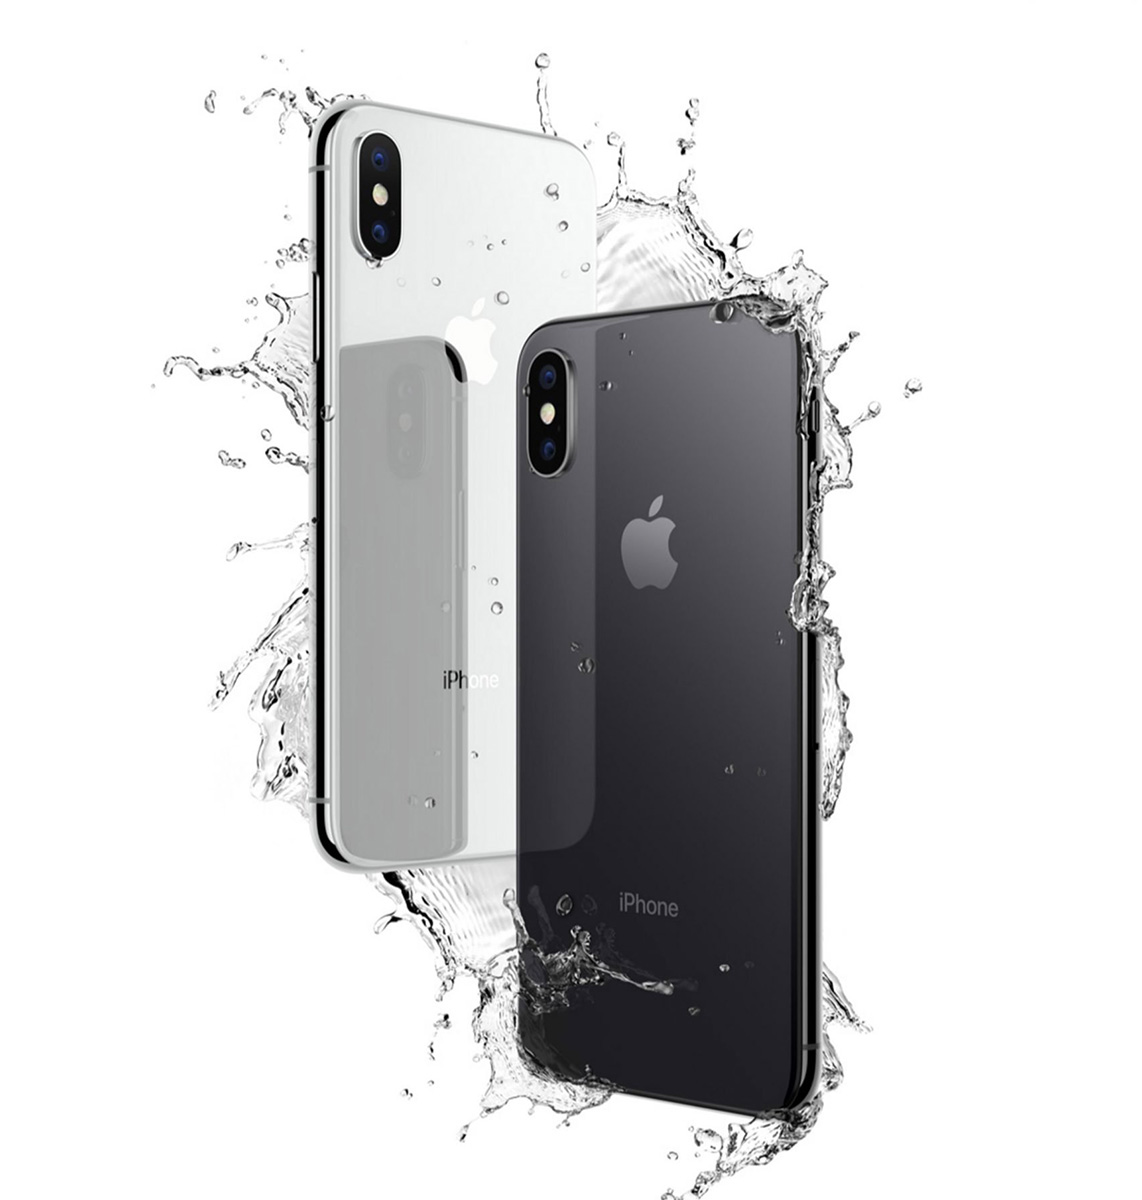 07-iphone-x-apple